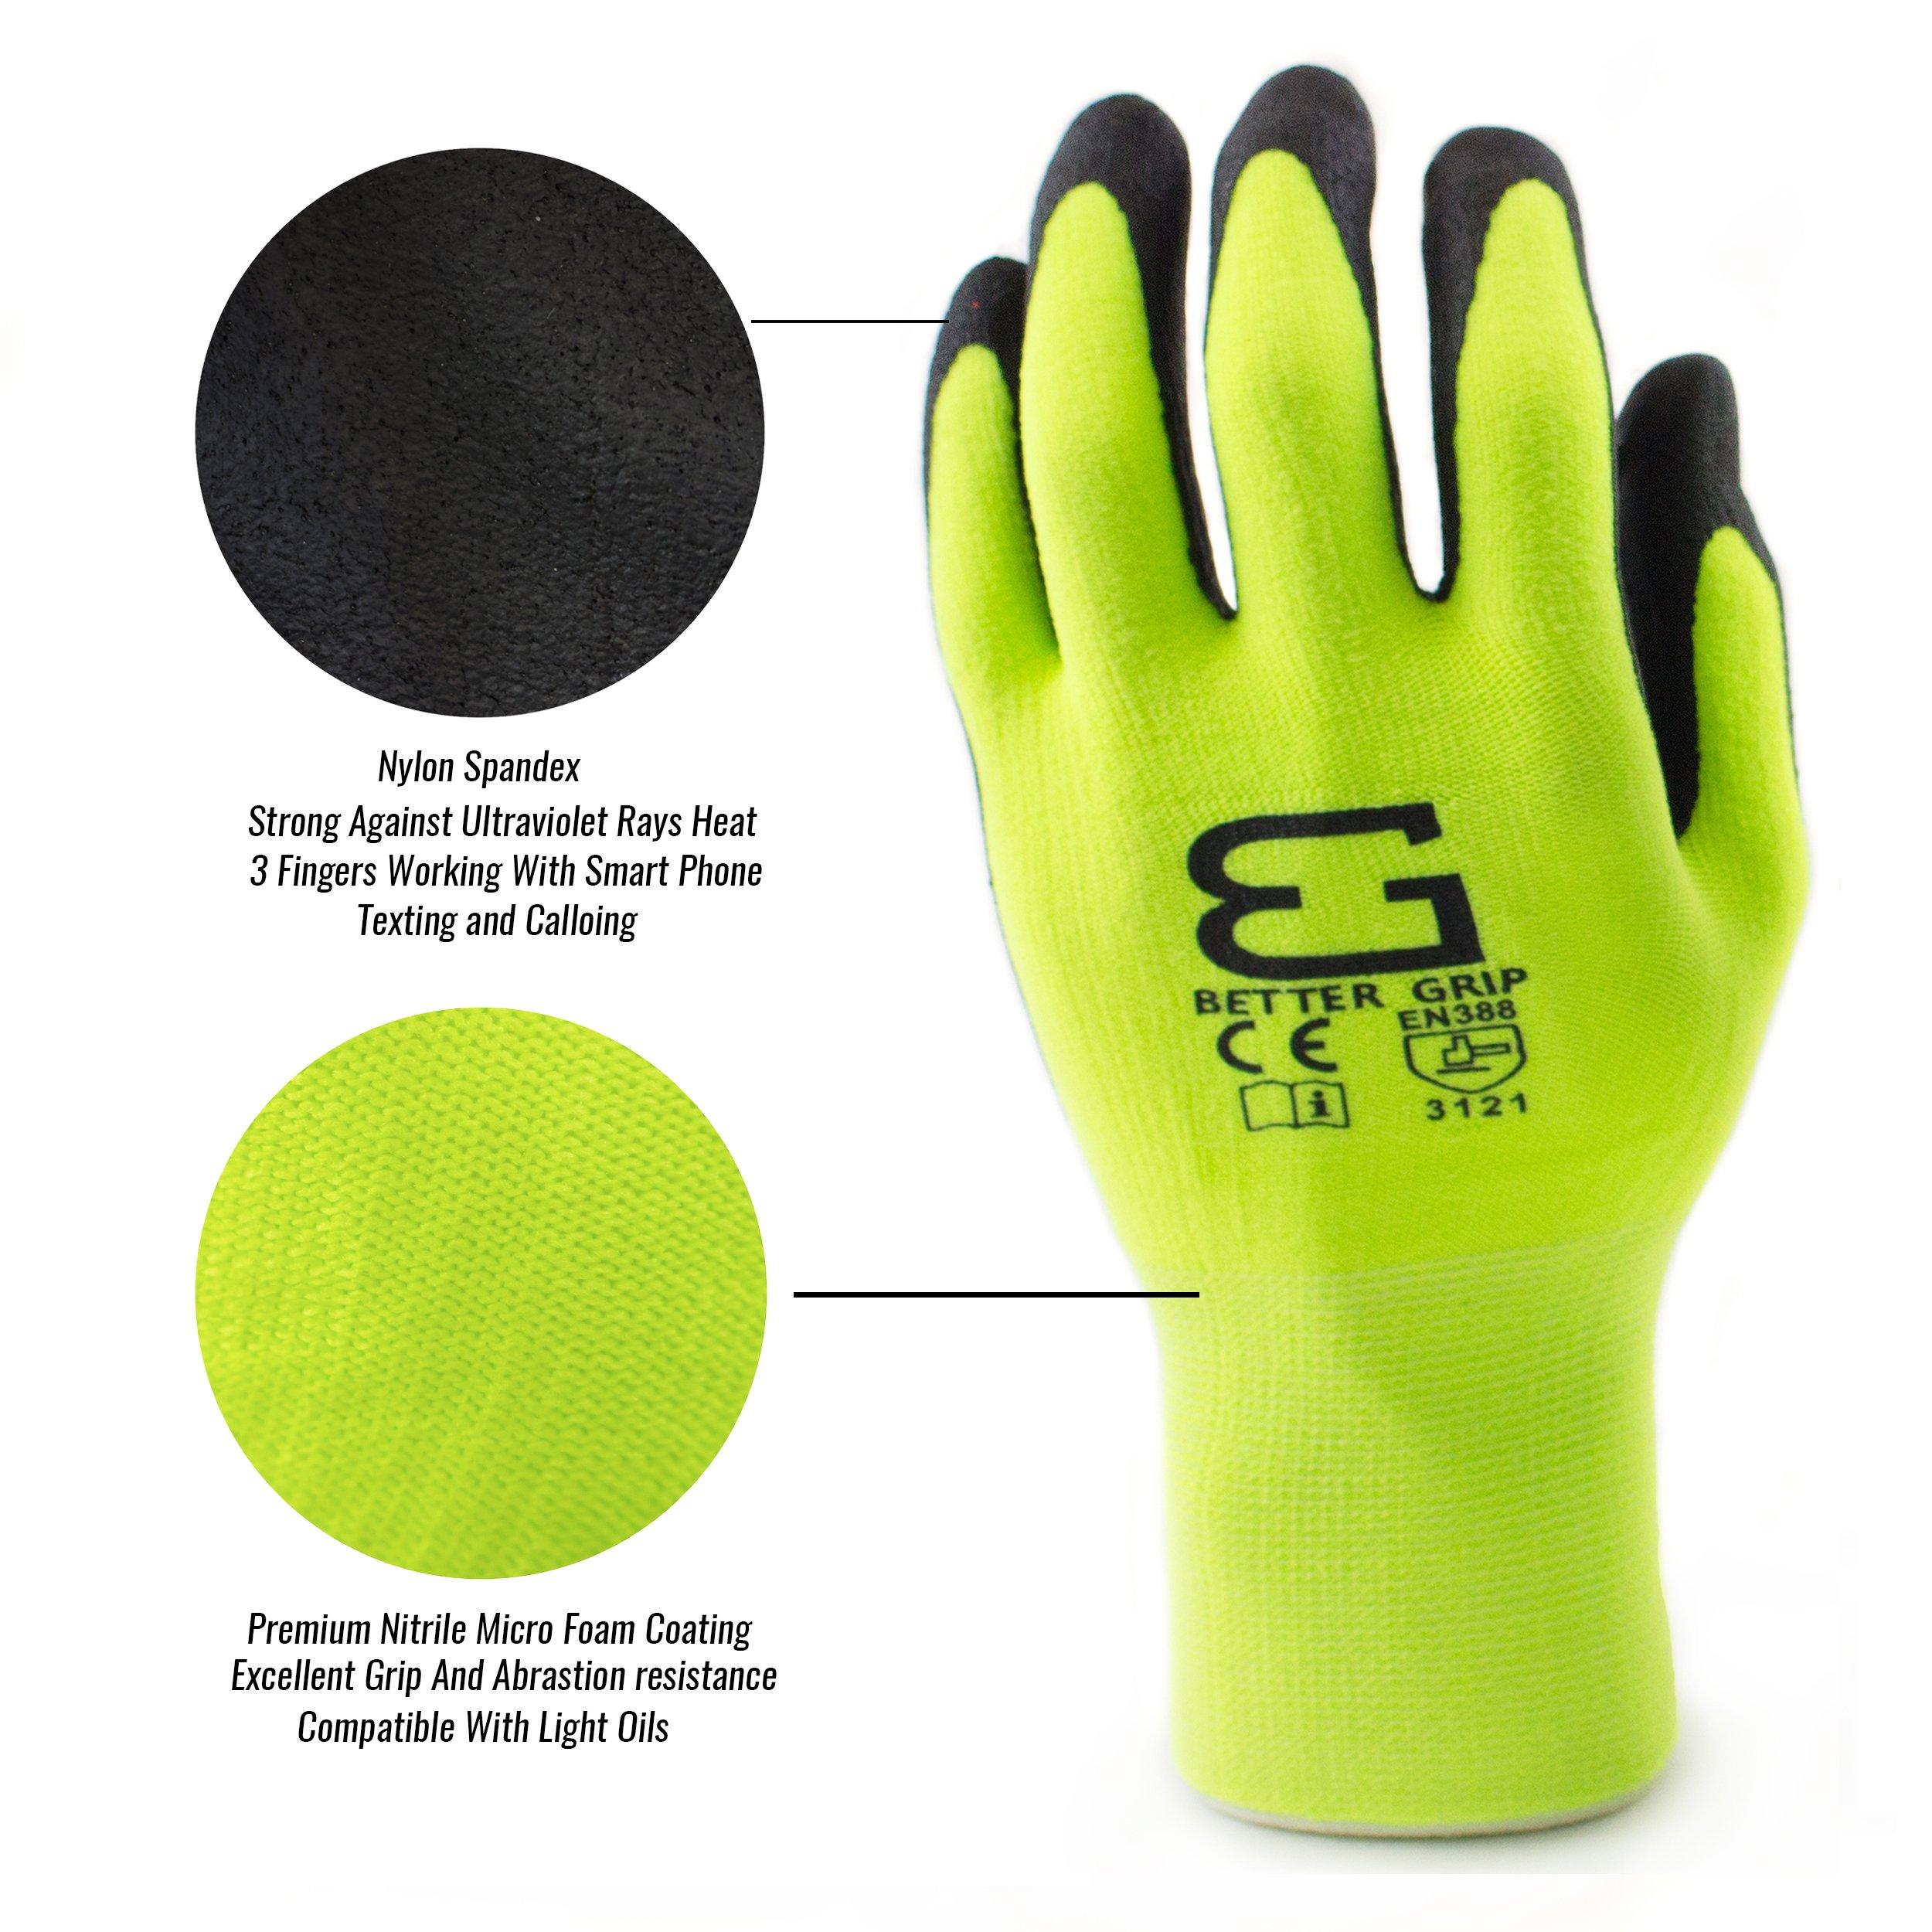 Spidergard SPL-RR50 50 Foot Wire Rope Self-Retracting Lifeline with Swivel Hook and Carabiner w/ Micro Foam Work Glove by Spidergard (Image #10)